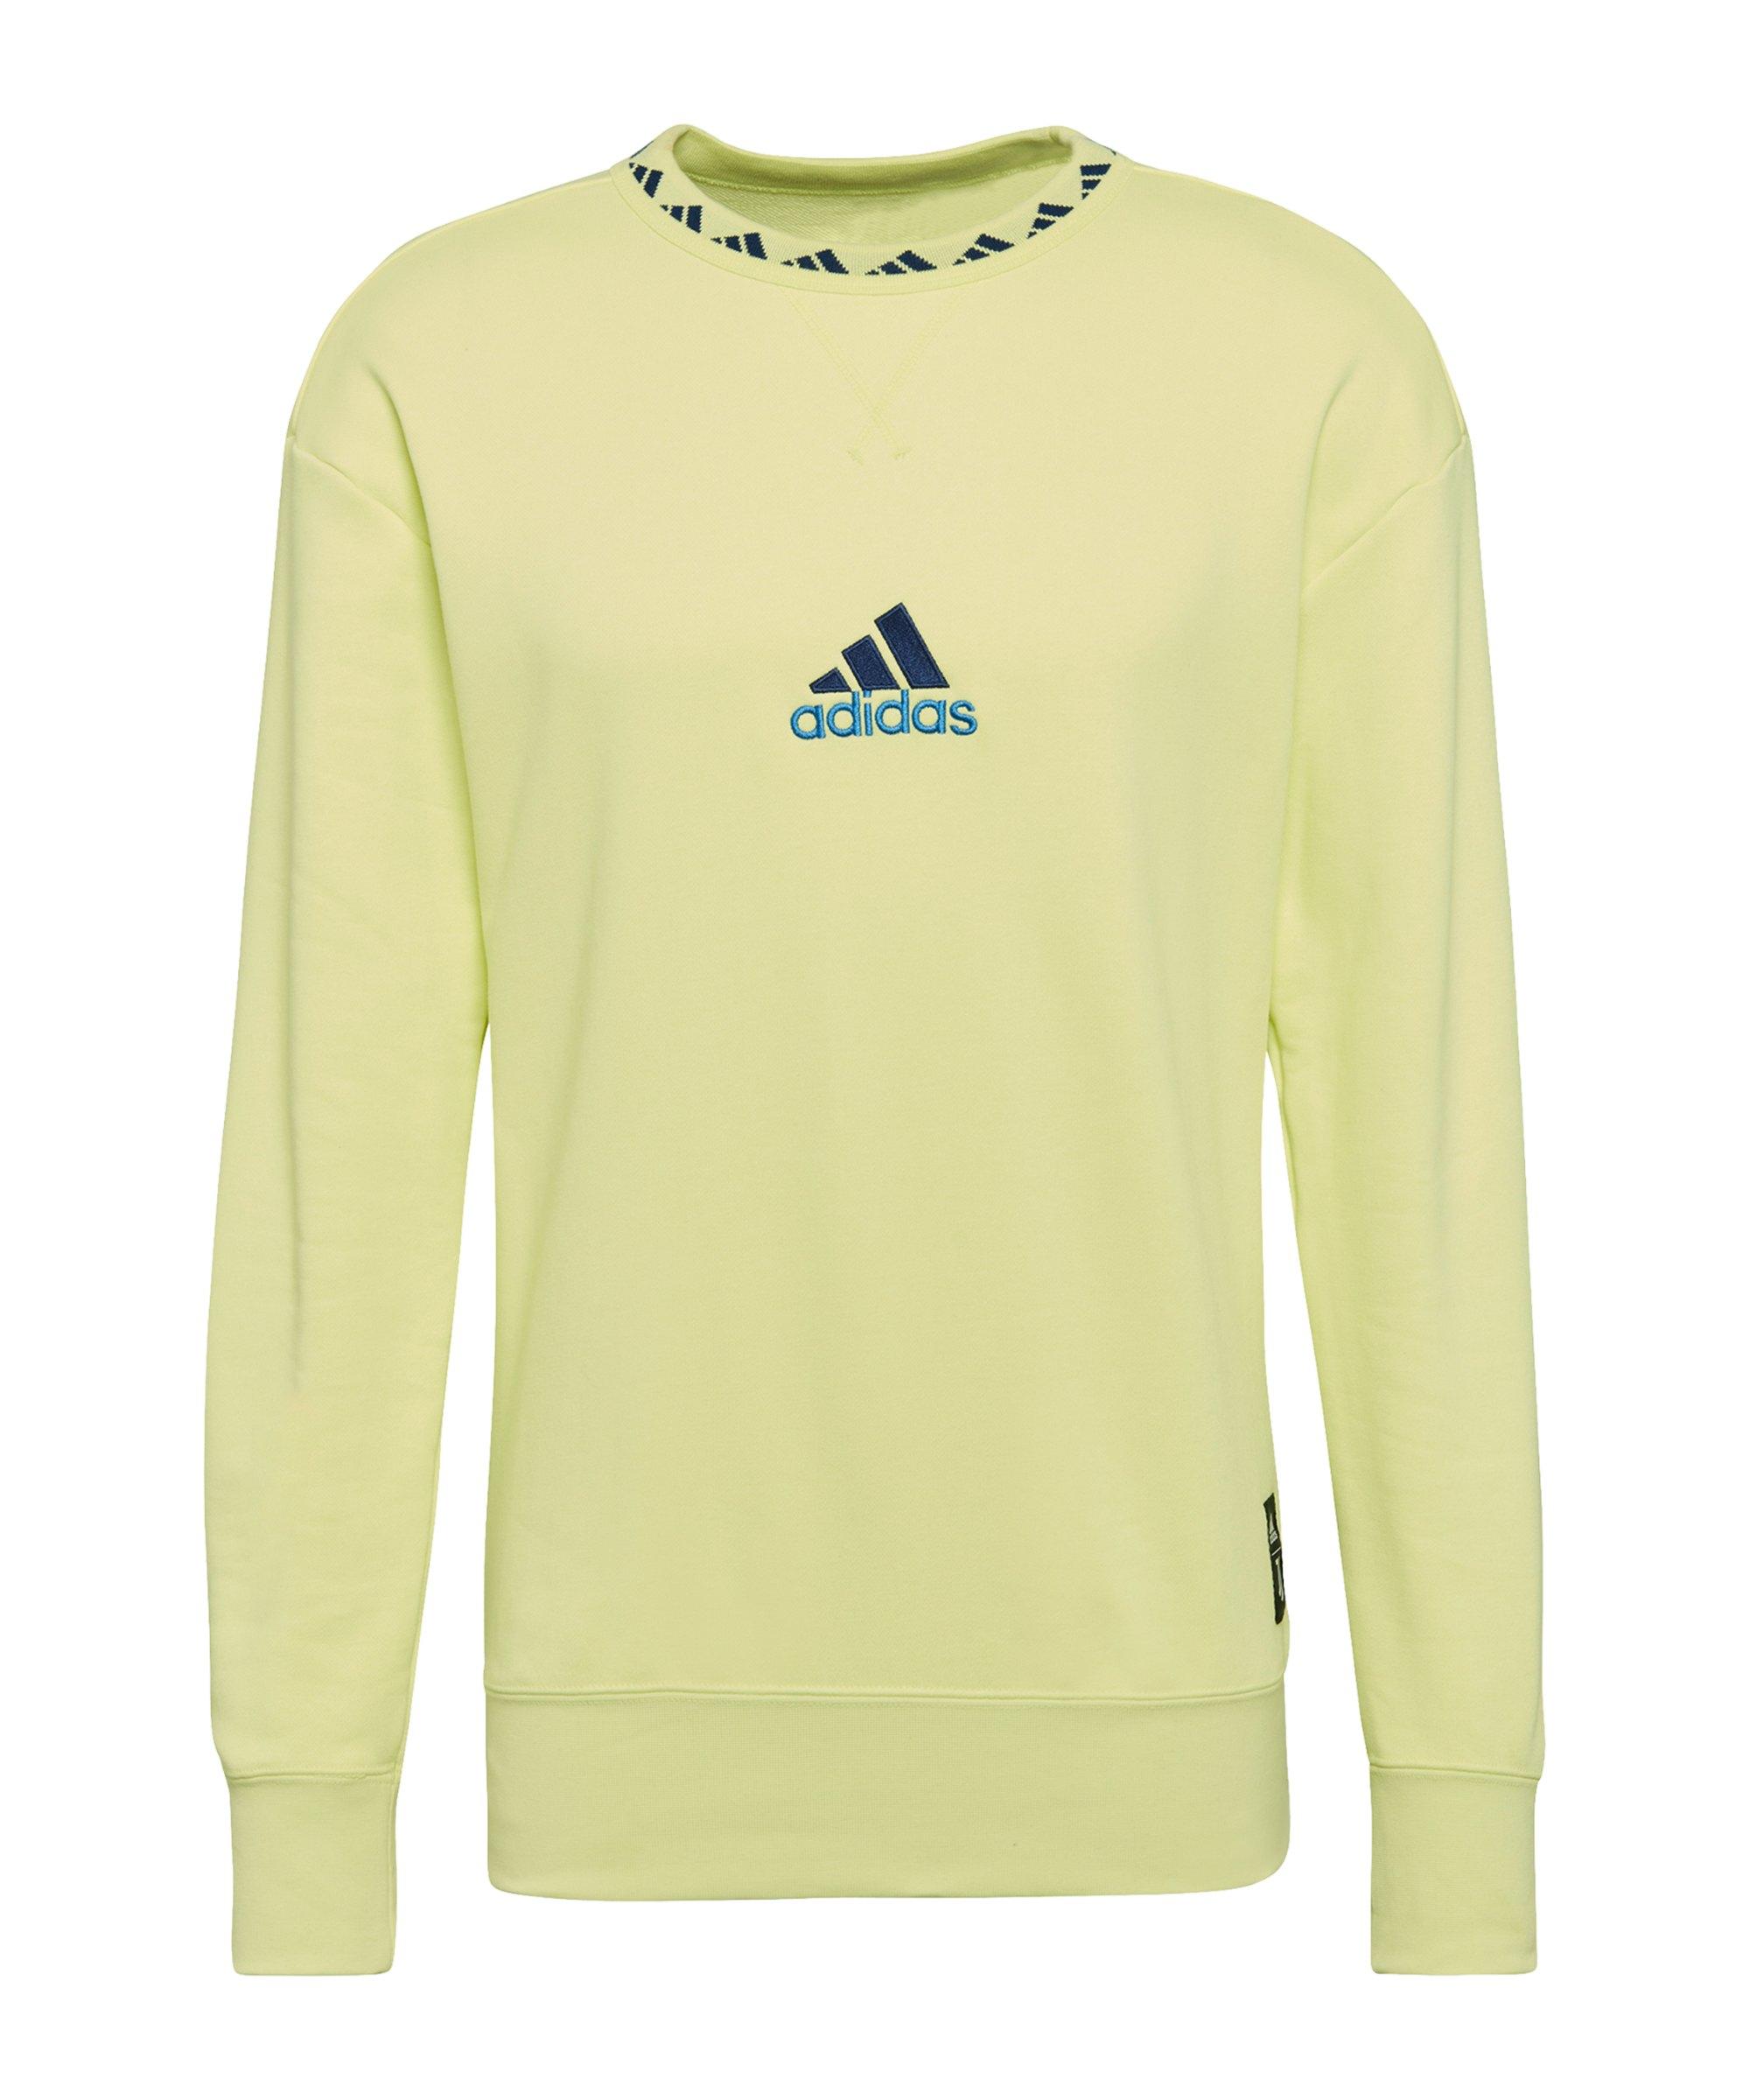 adidas Juventus Turin Icon Sweatshirt Gelb - gelb